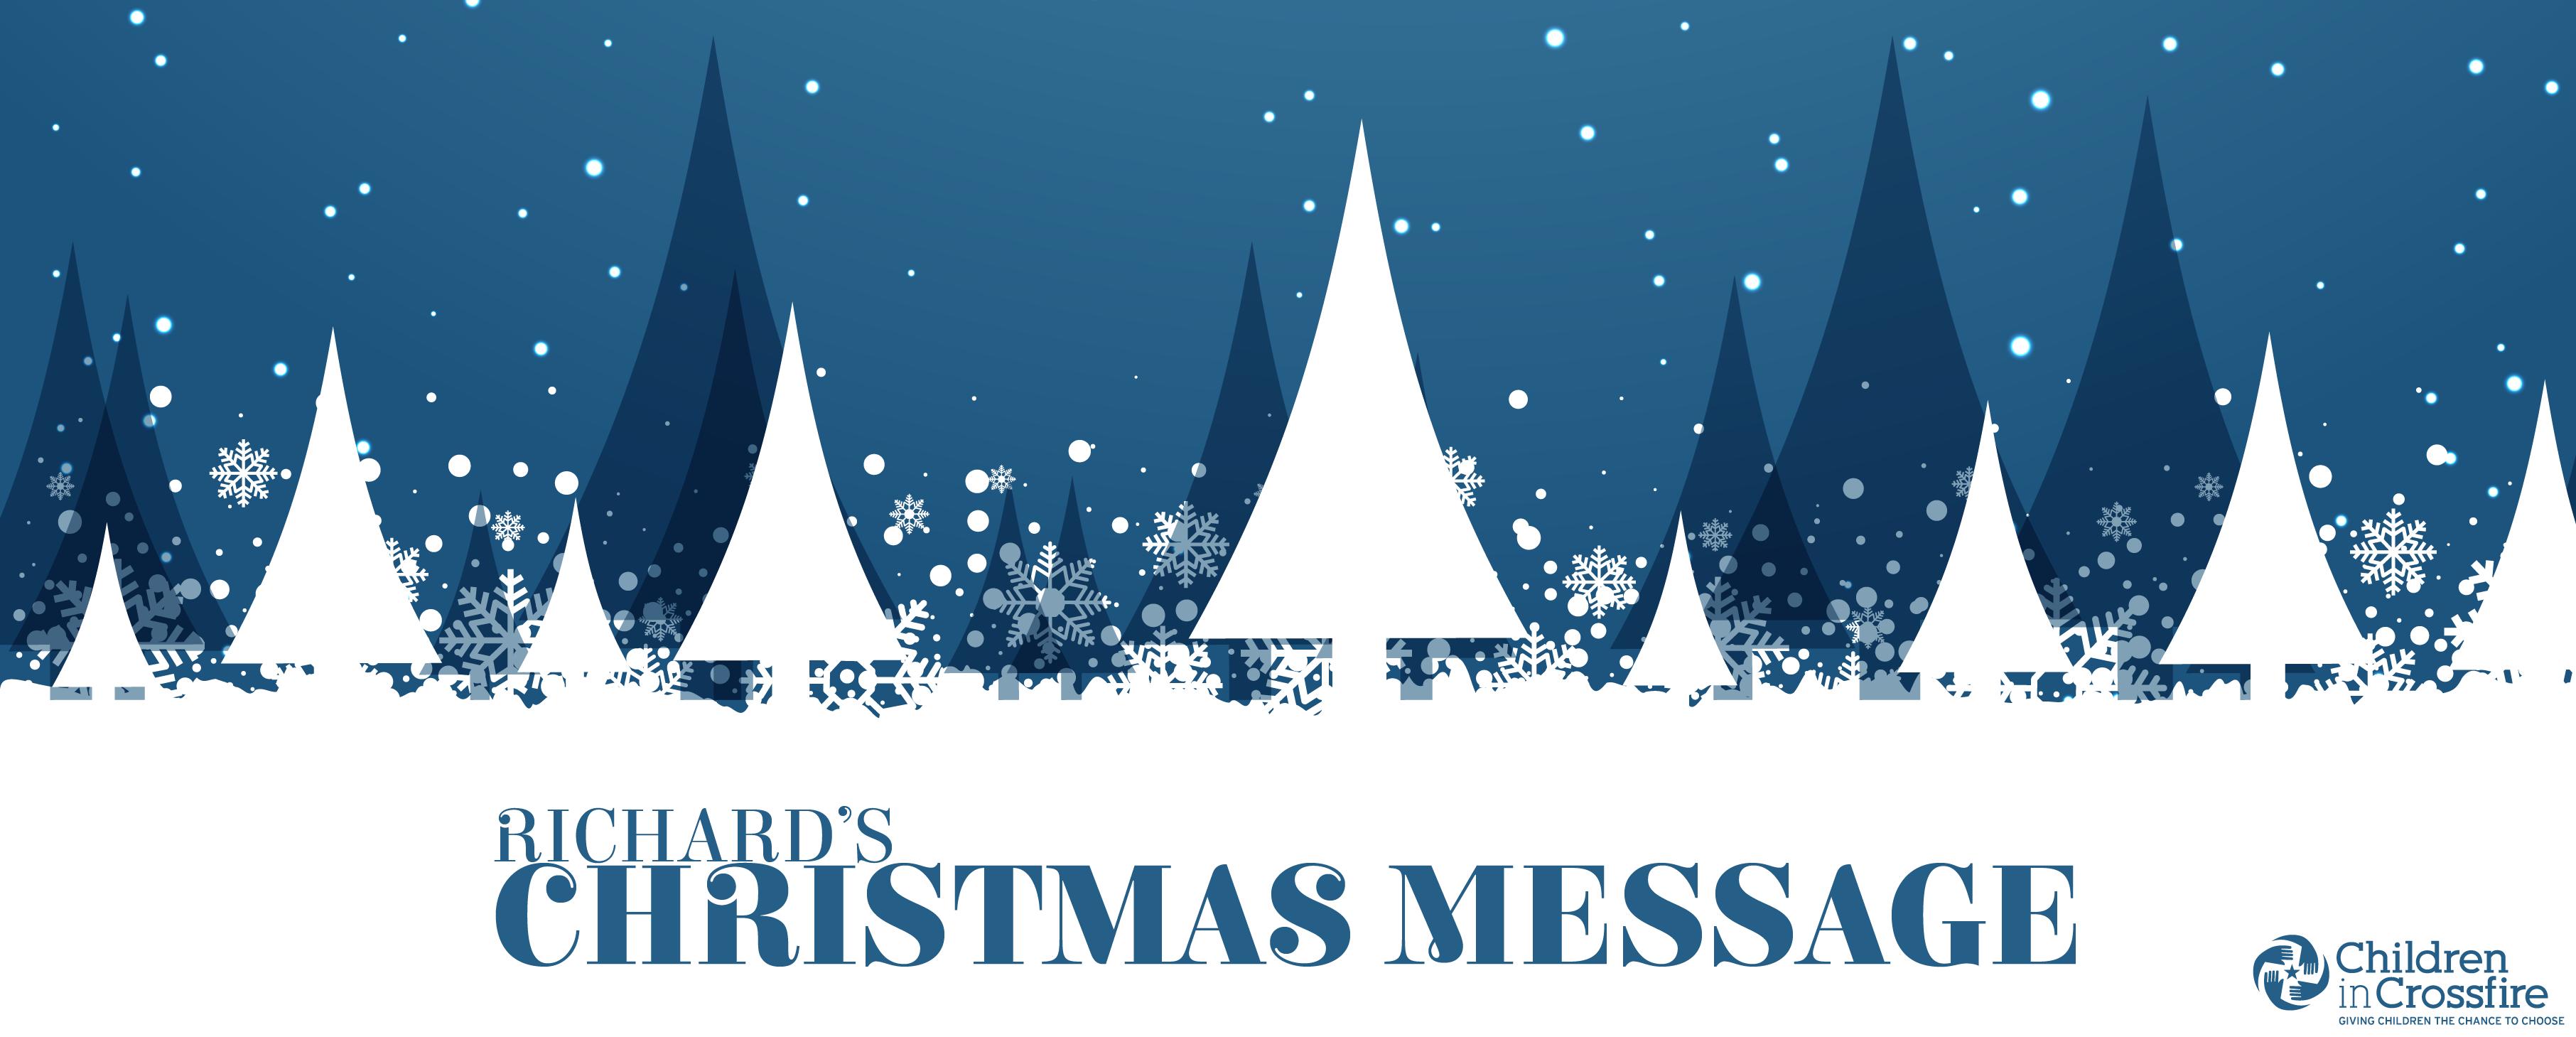 Richard\'s Christmas Message - Children in Crossfire